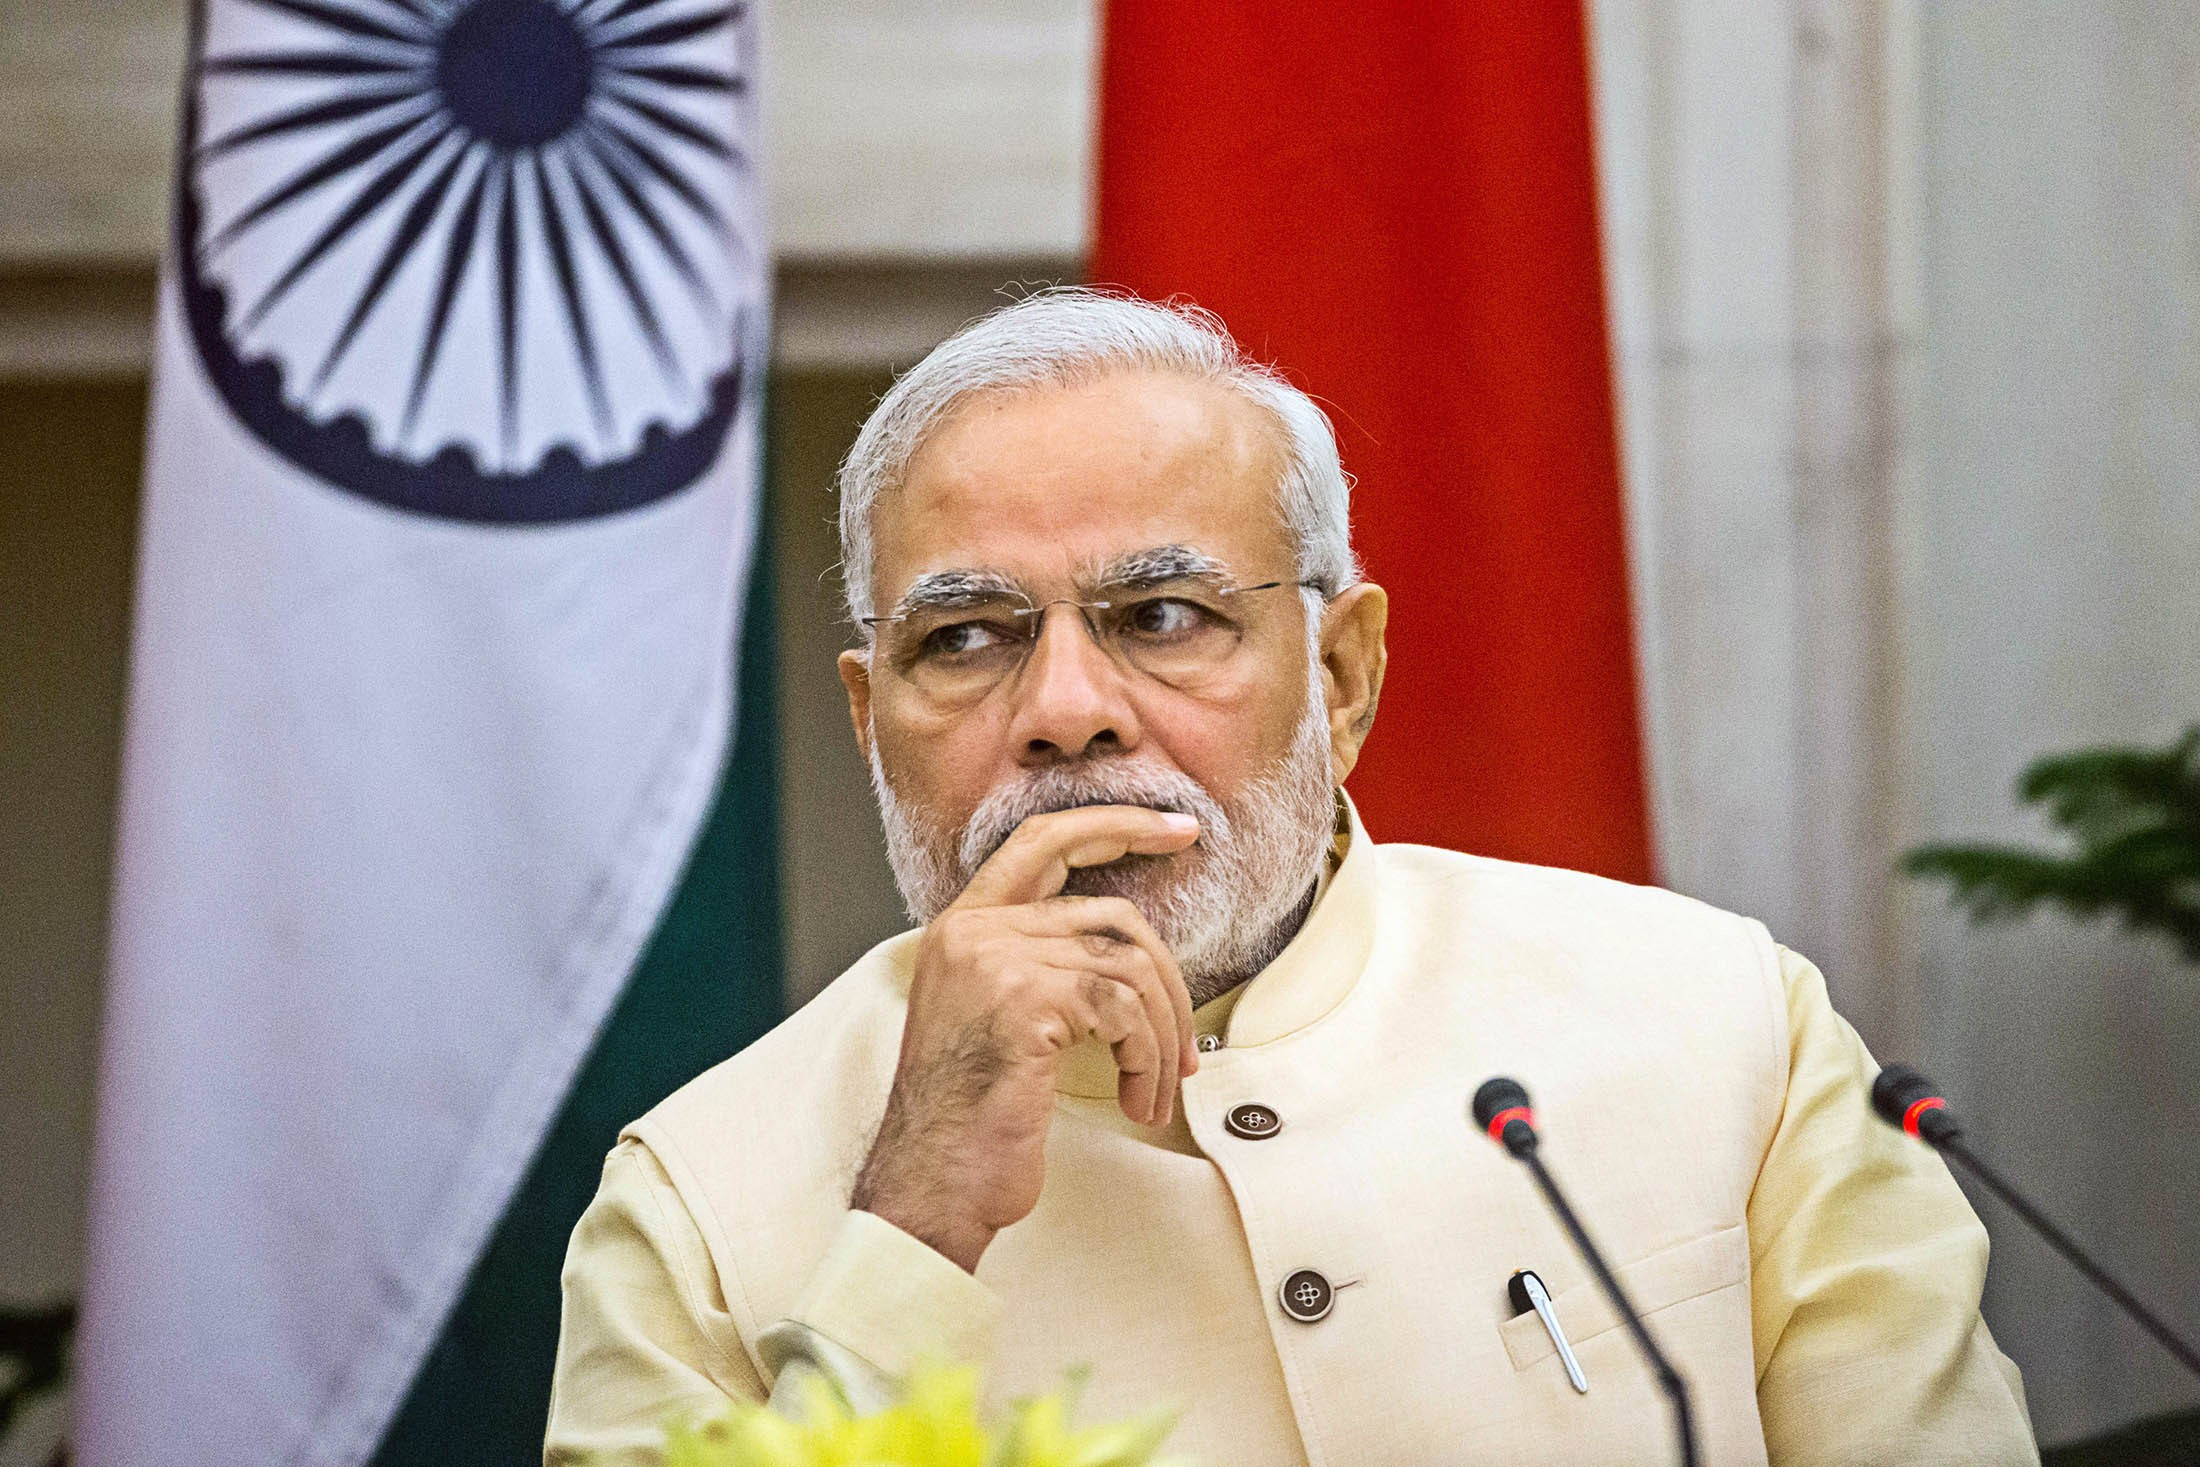 Narendra Modi. Foto de: Bloomberg